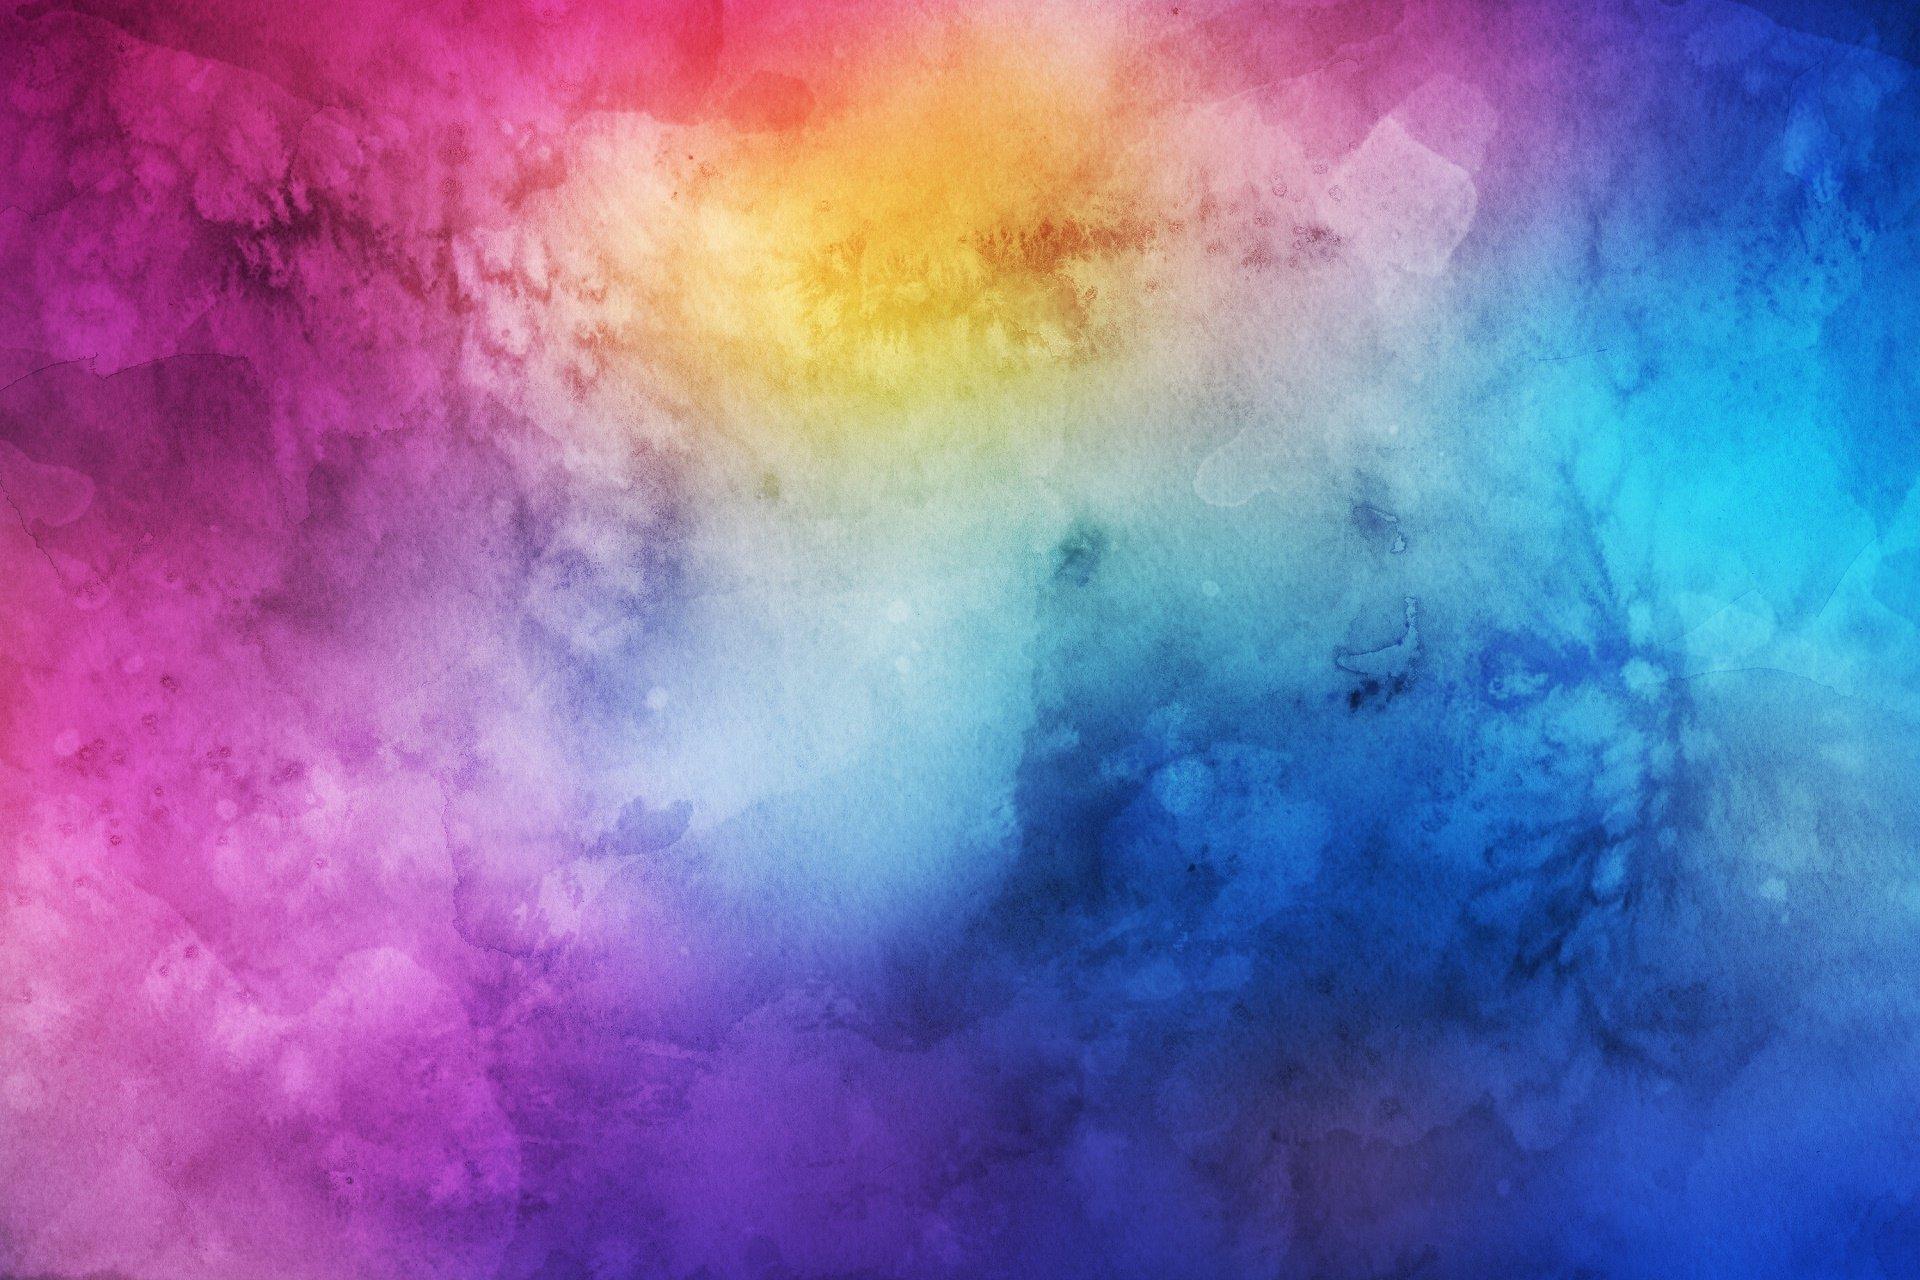 Free Photo Watercolors Rainbow Colors Lilac: Watercolor HD Wallpaper